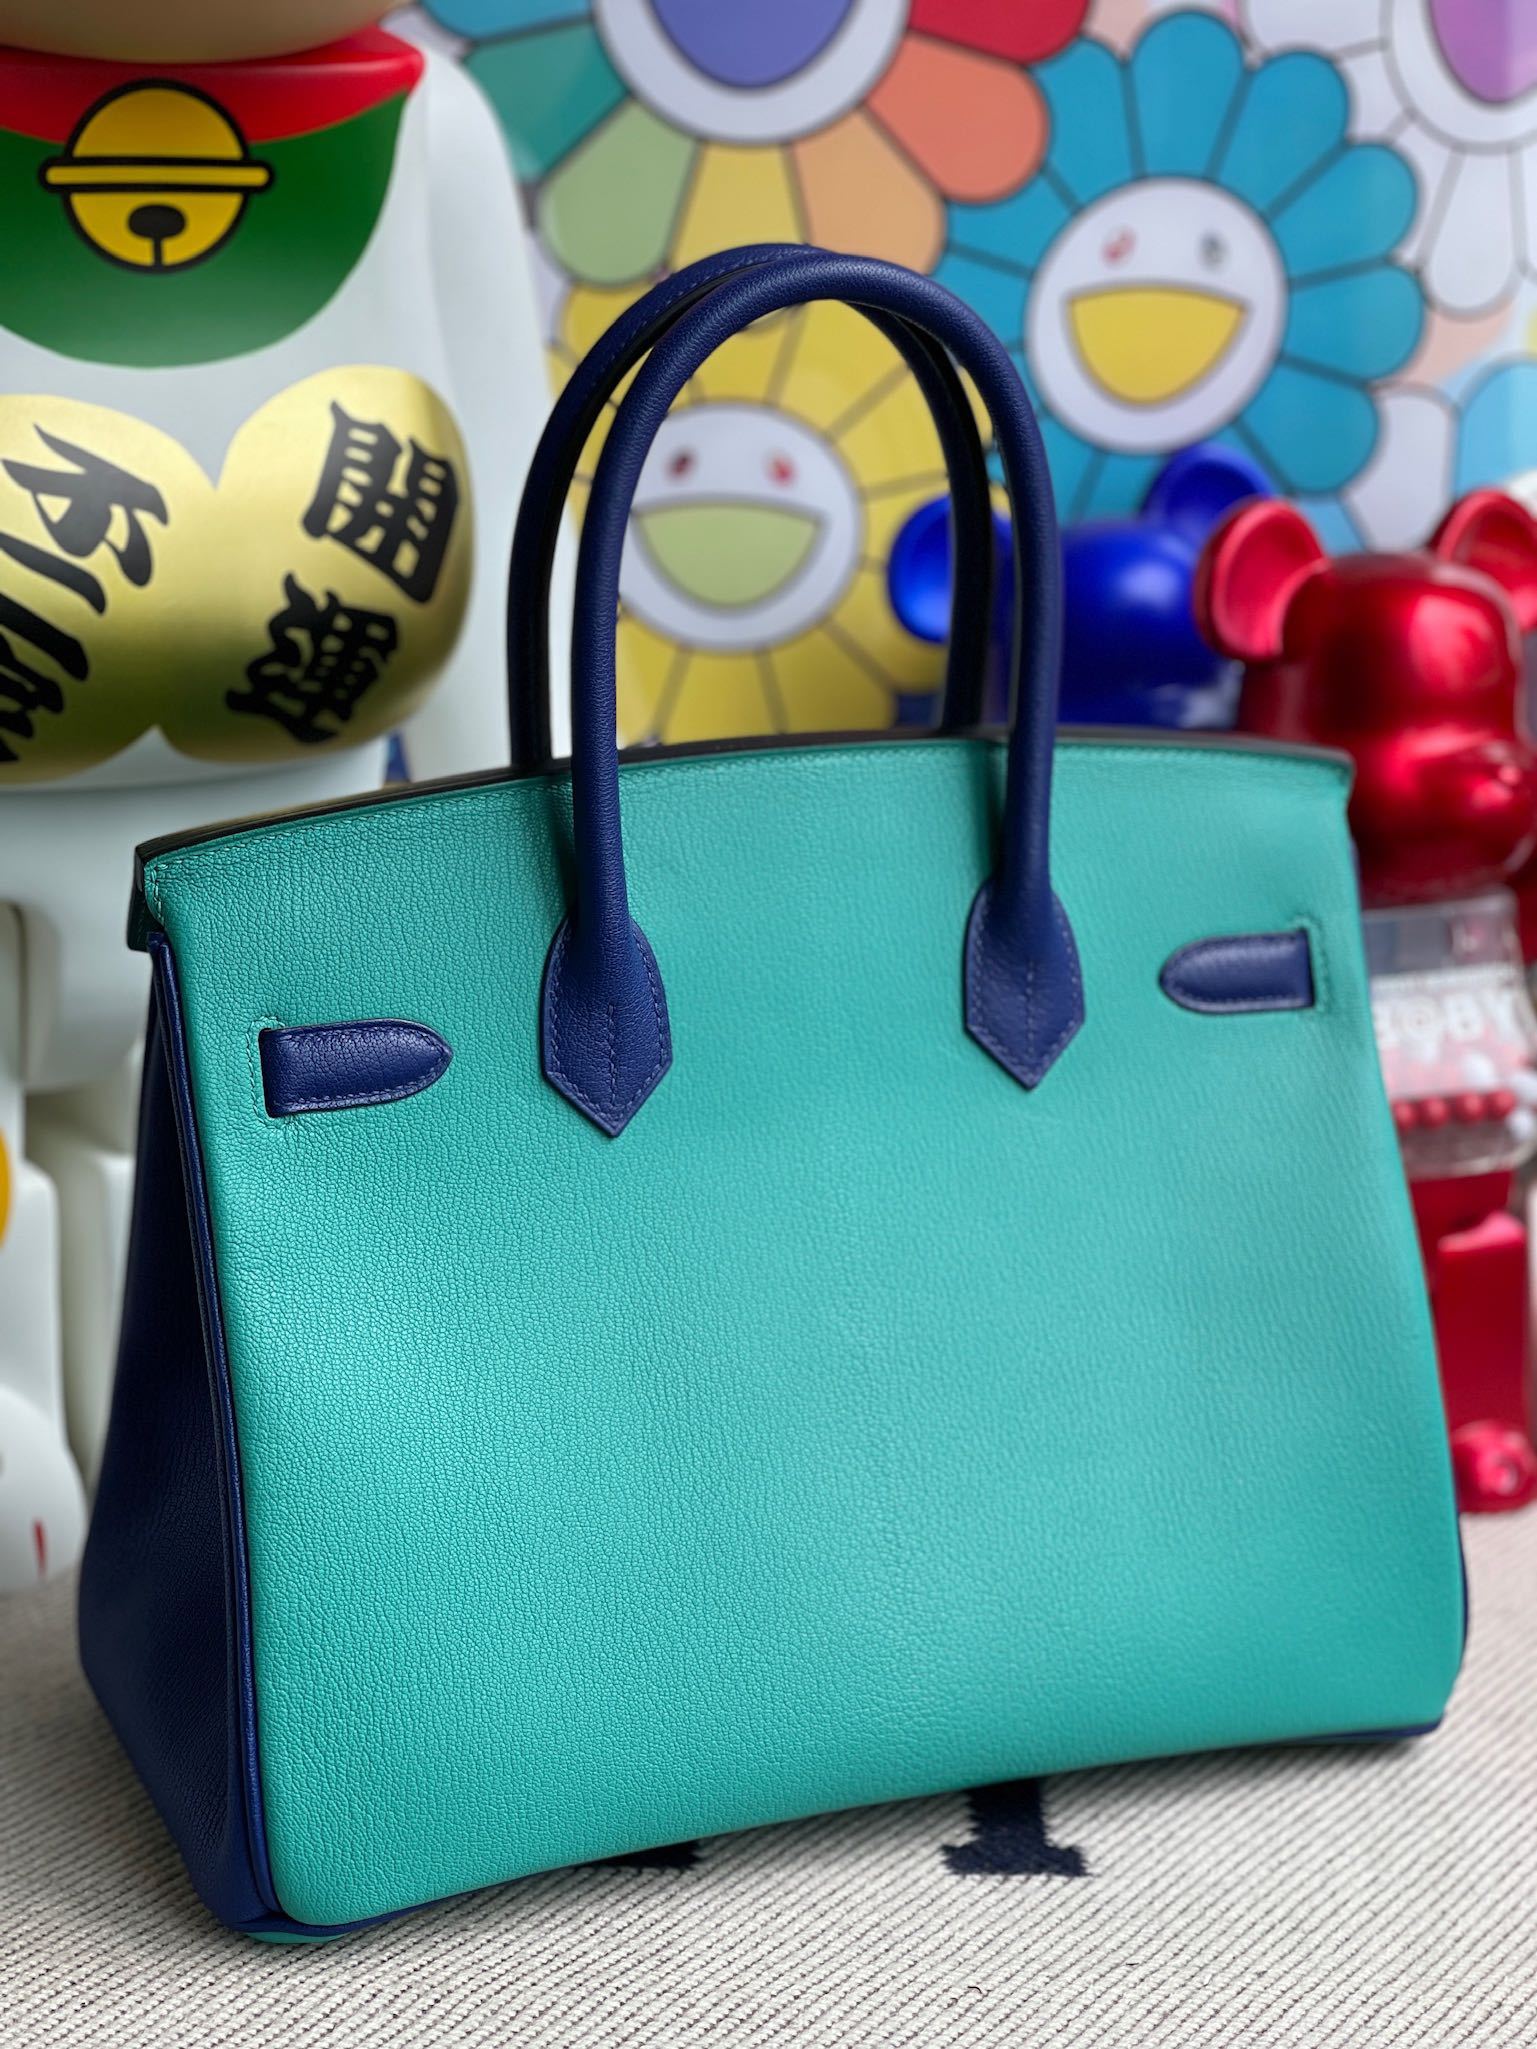 Hermès(爱马仕)Birkin 铂金包 Chevre 山羊皮 孔雀蓝 拼 电光蓝 金扣 30cm 顶级手缝